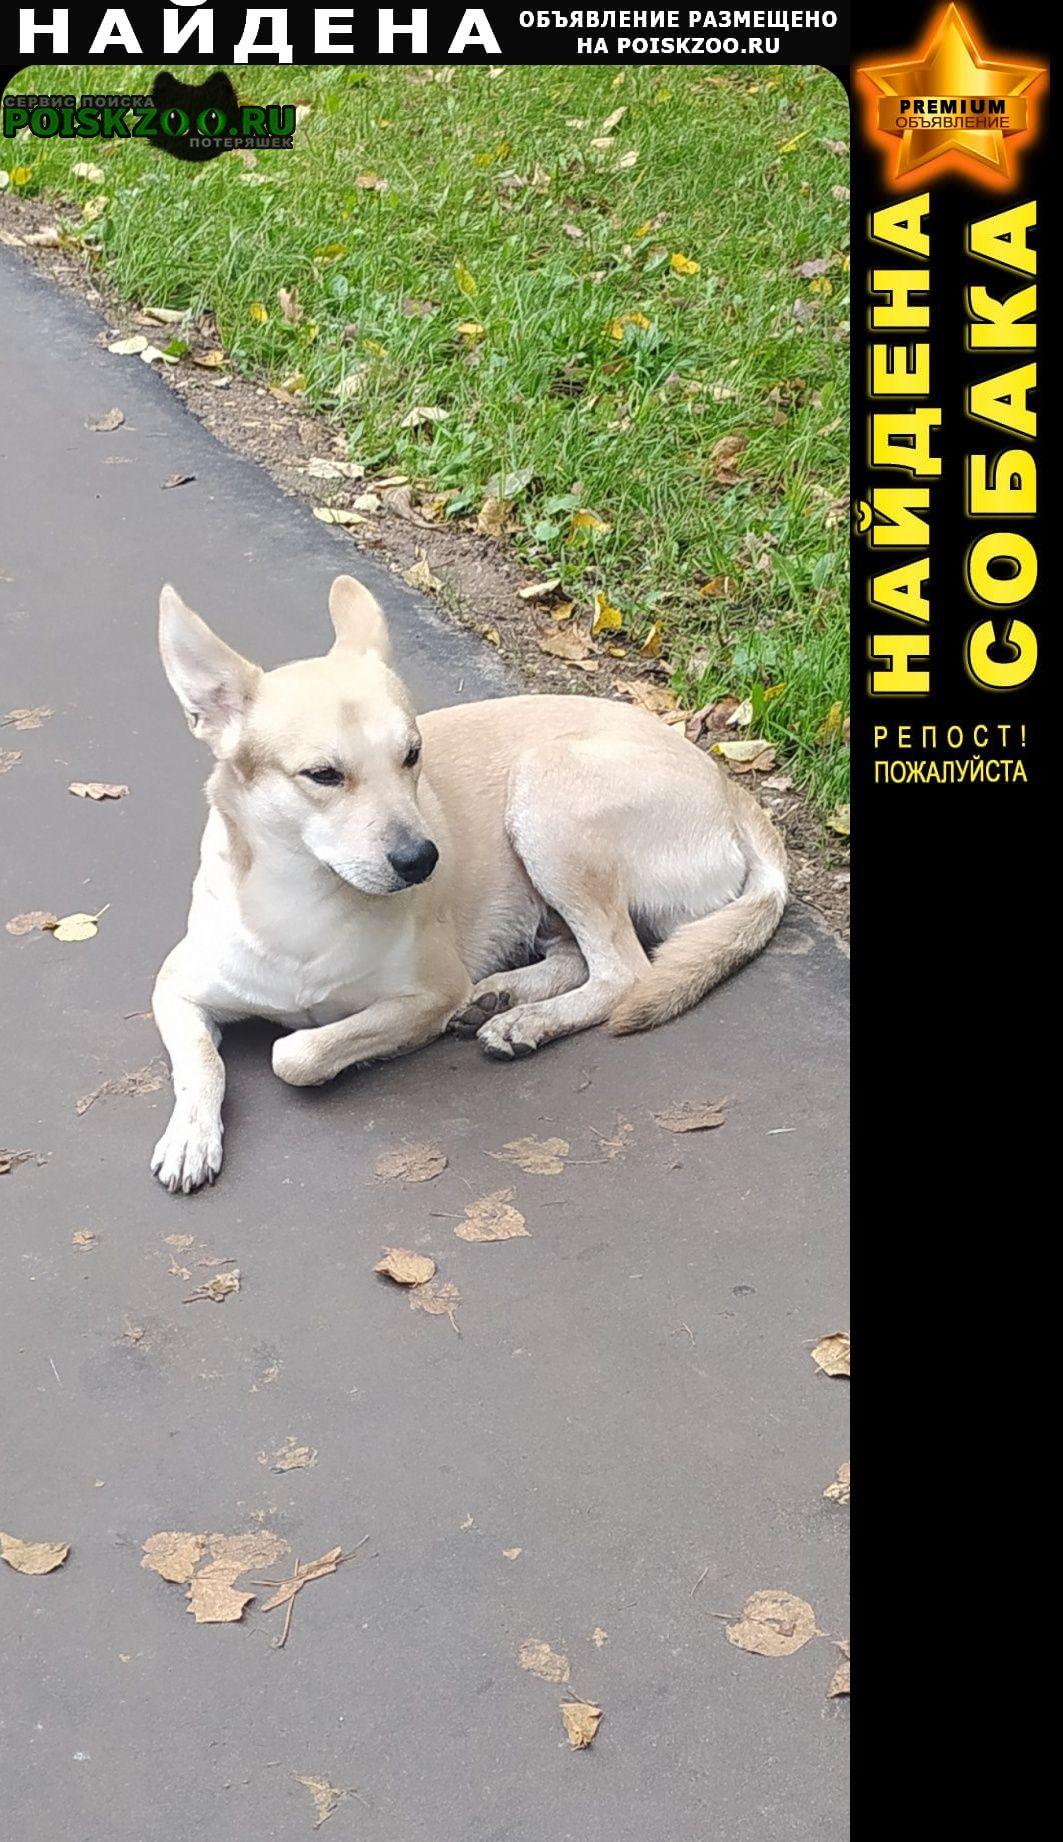 Найдена собака кобель собака молодая Москва